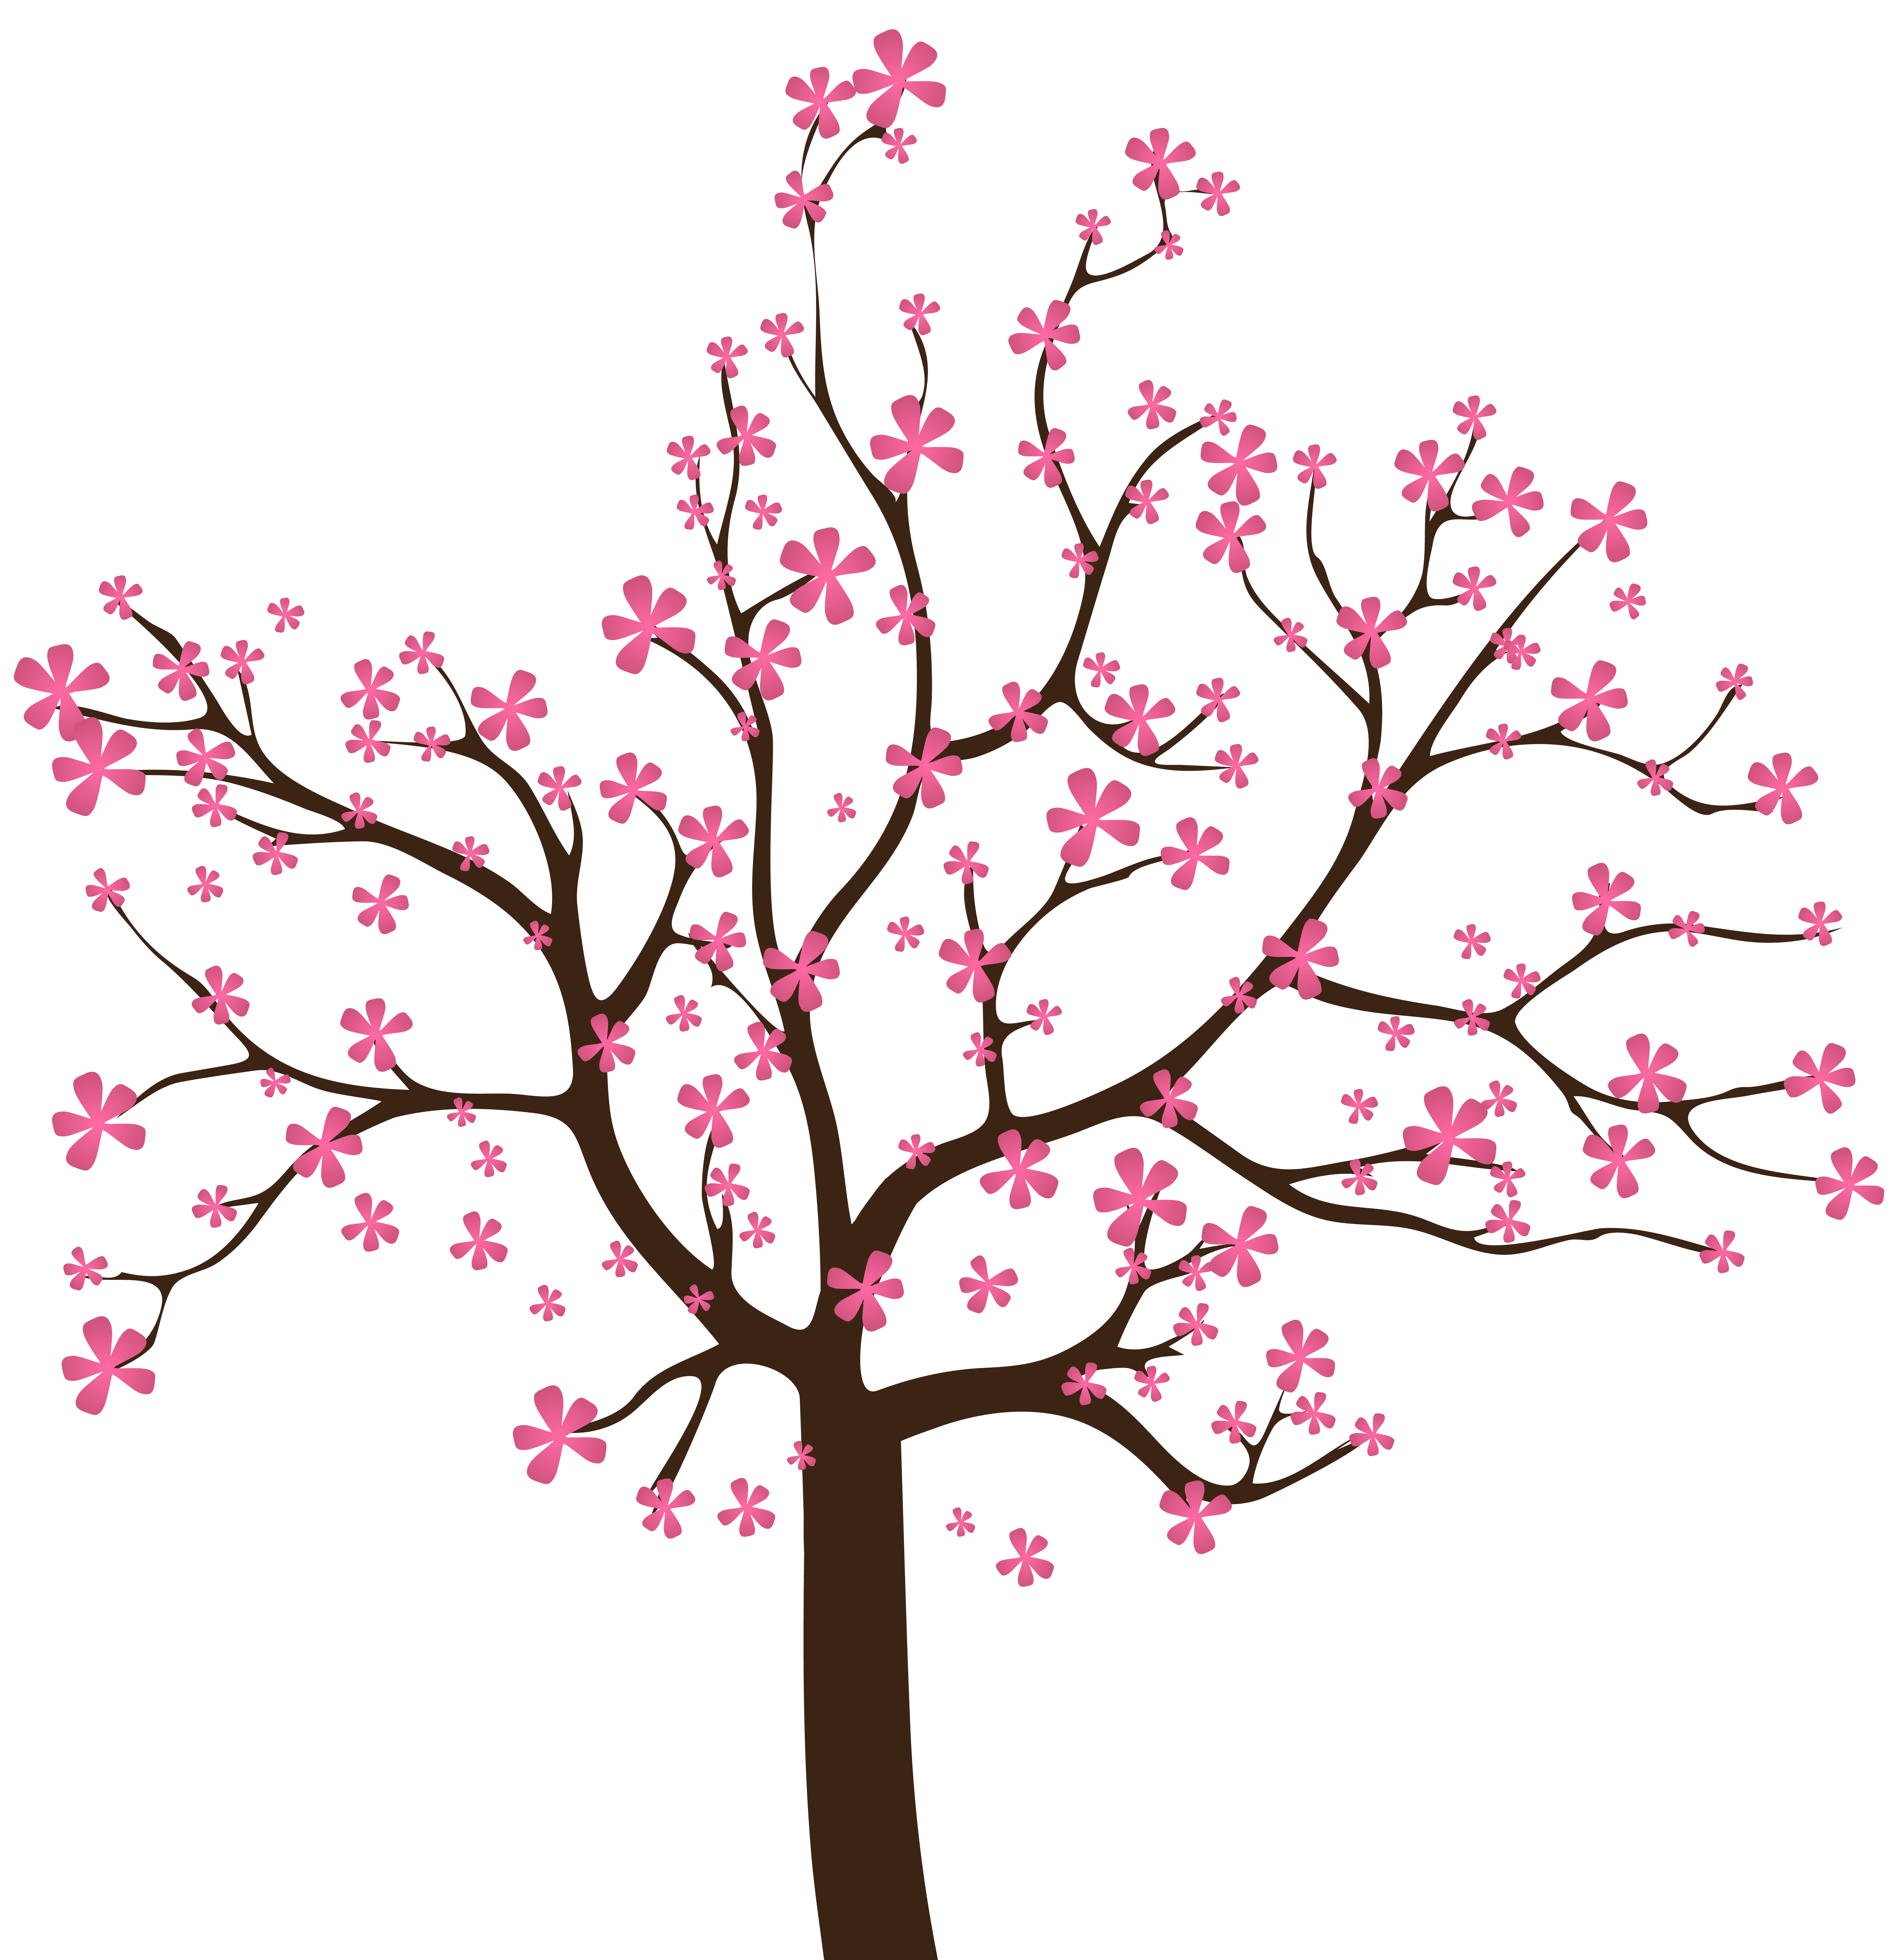 Clipart spring tree svg transparent Spring Tree PNG Clip Art Image | Gallery Yopriceville - High ... svg transparent